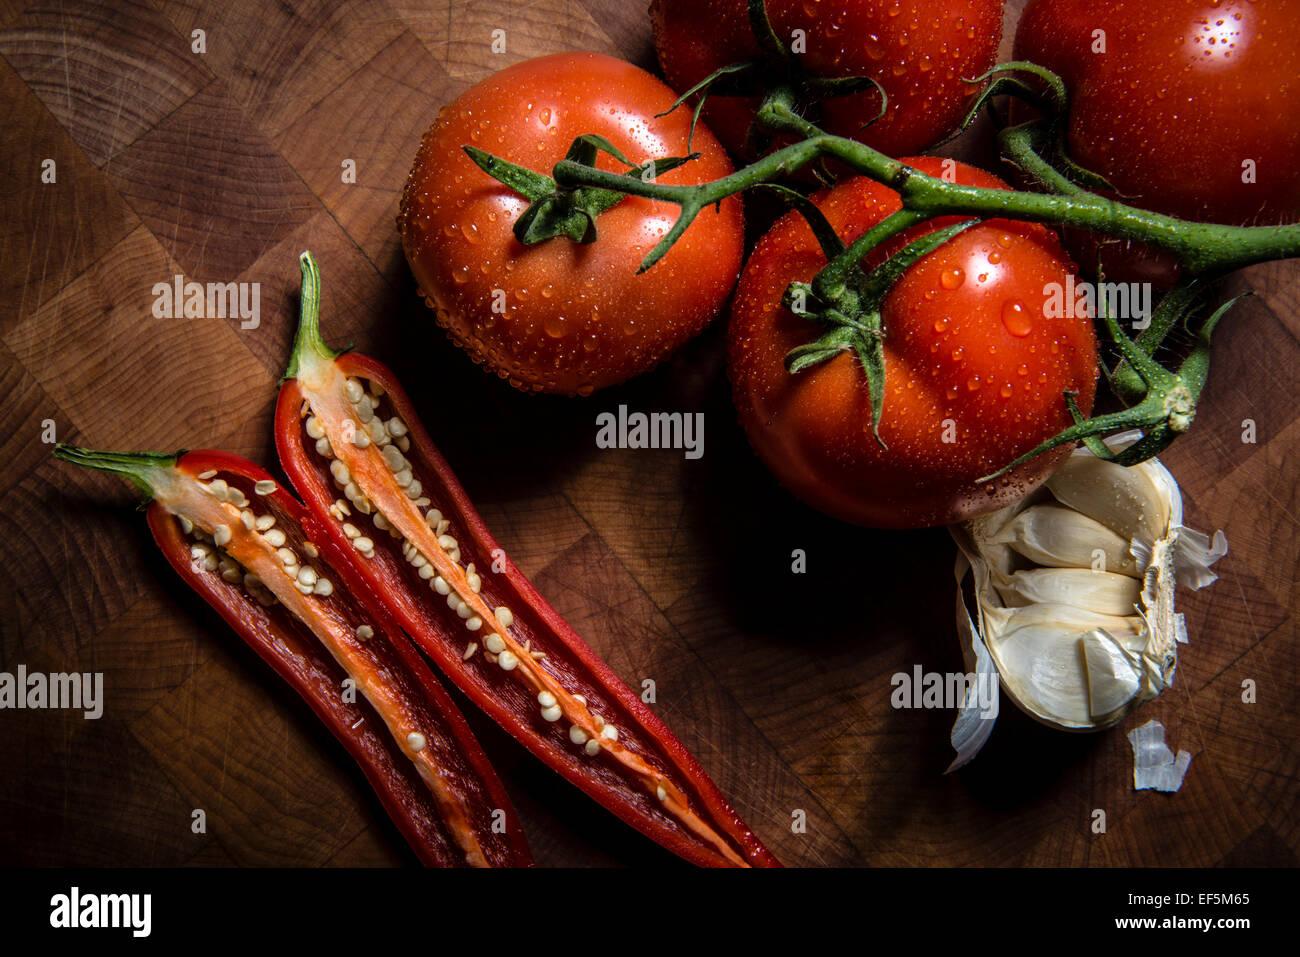 Tomaten, rote Chili und Knoblauch auf einem Schneidebrett Stockbild